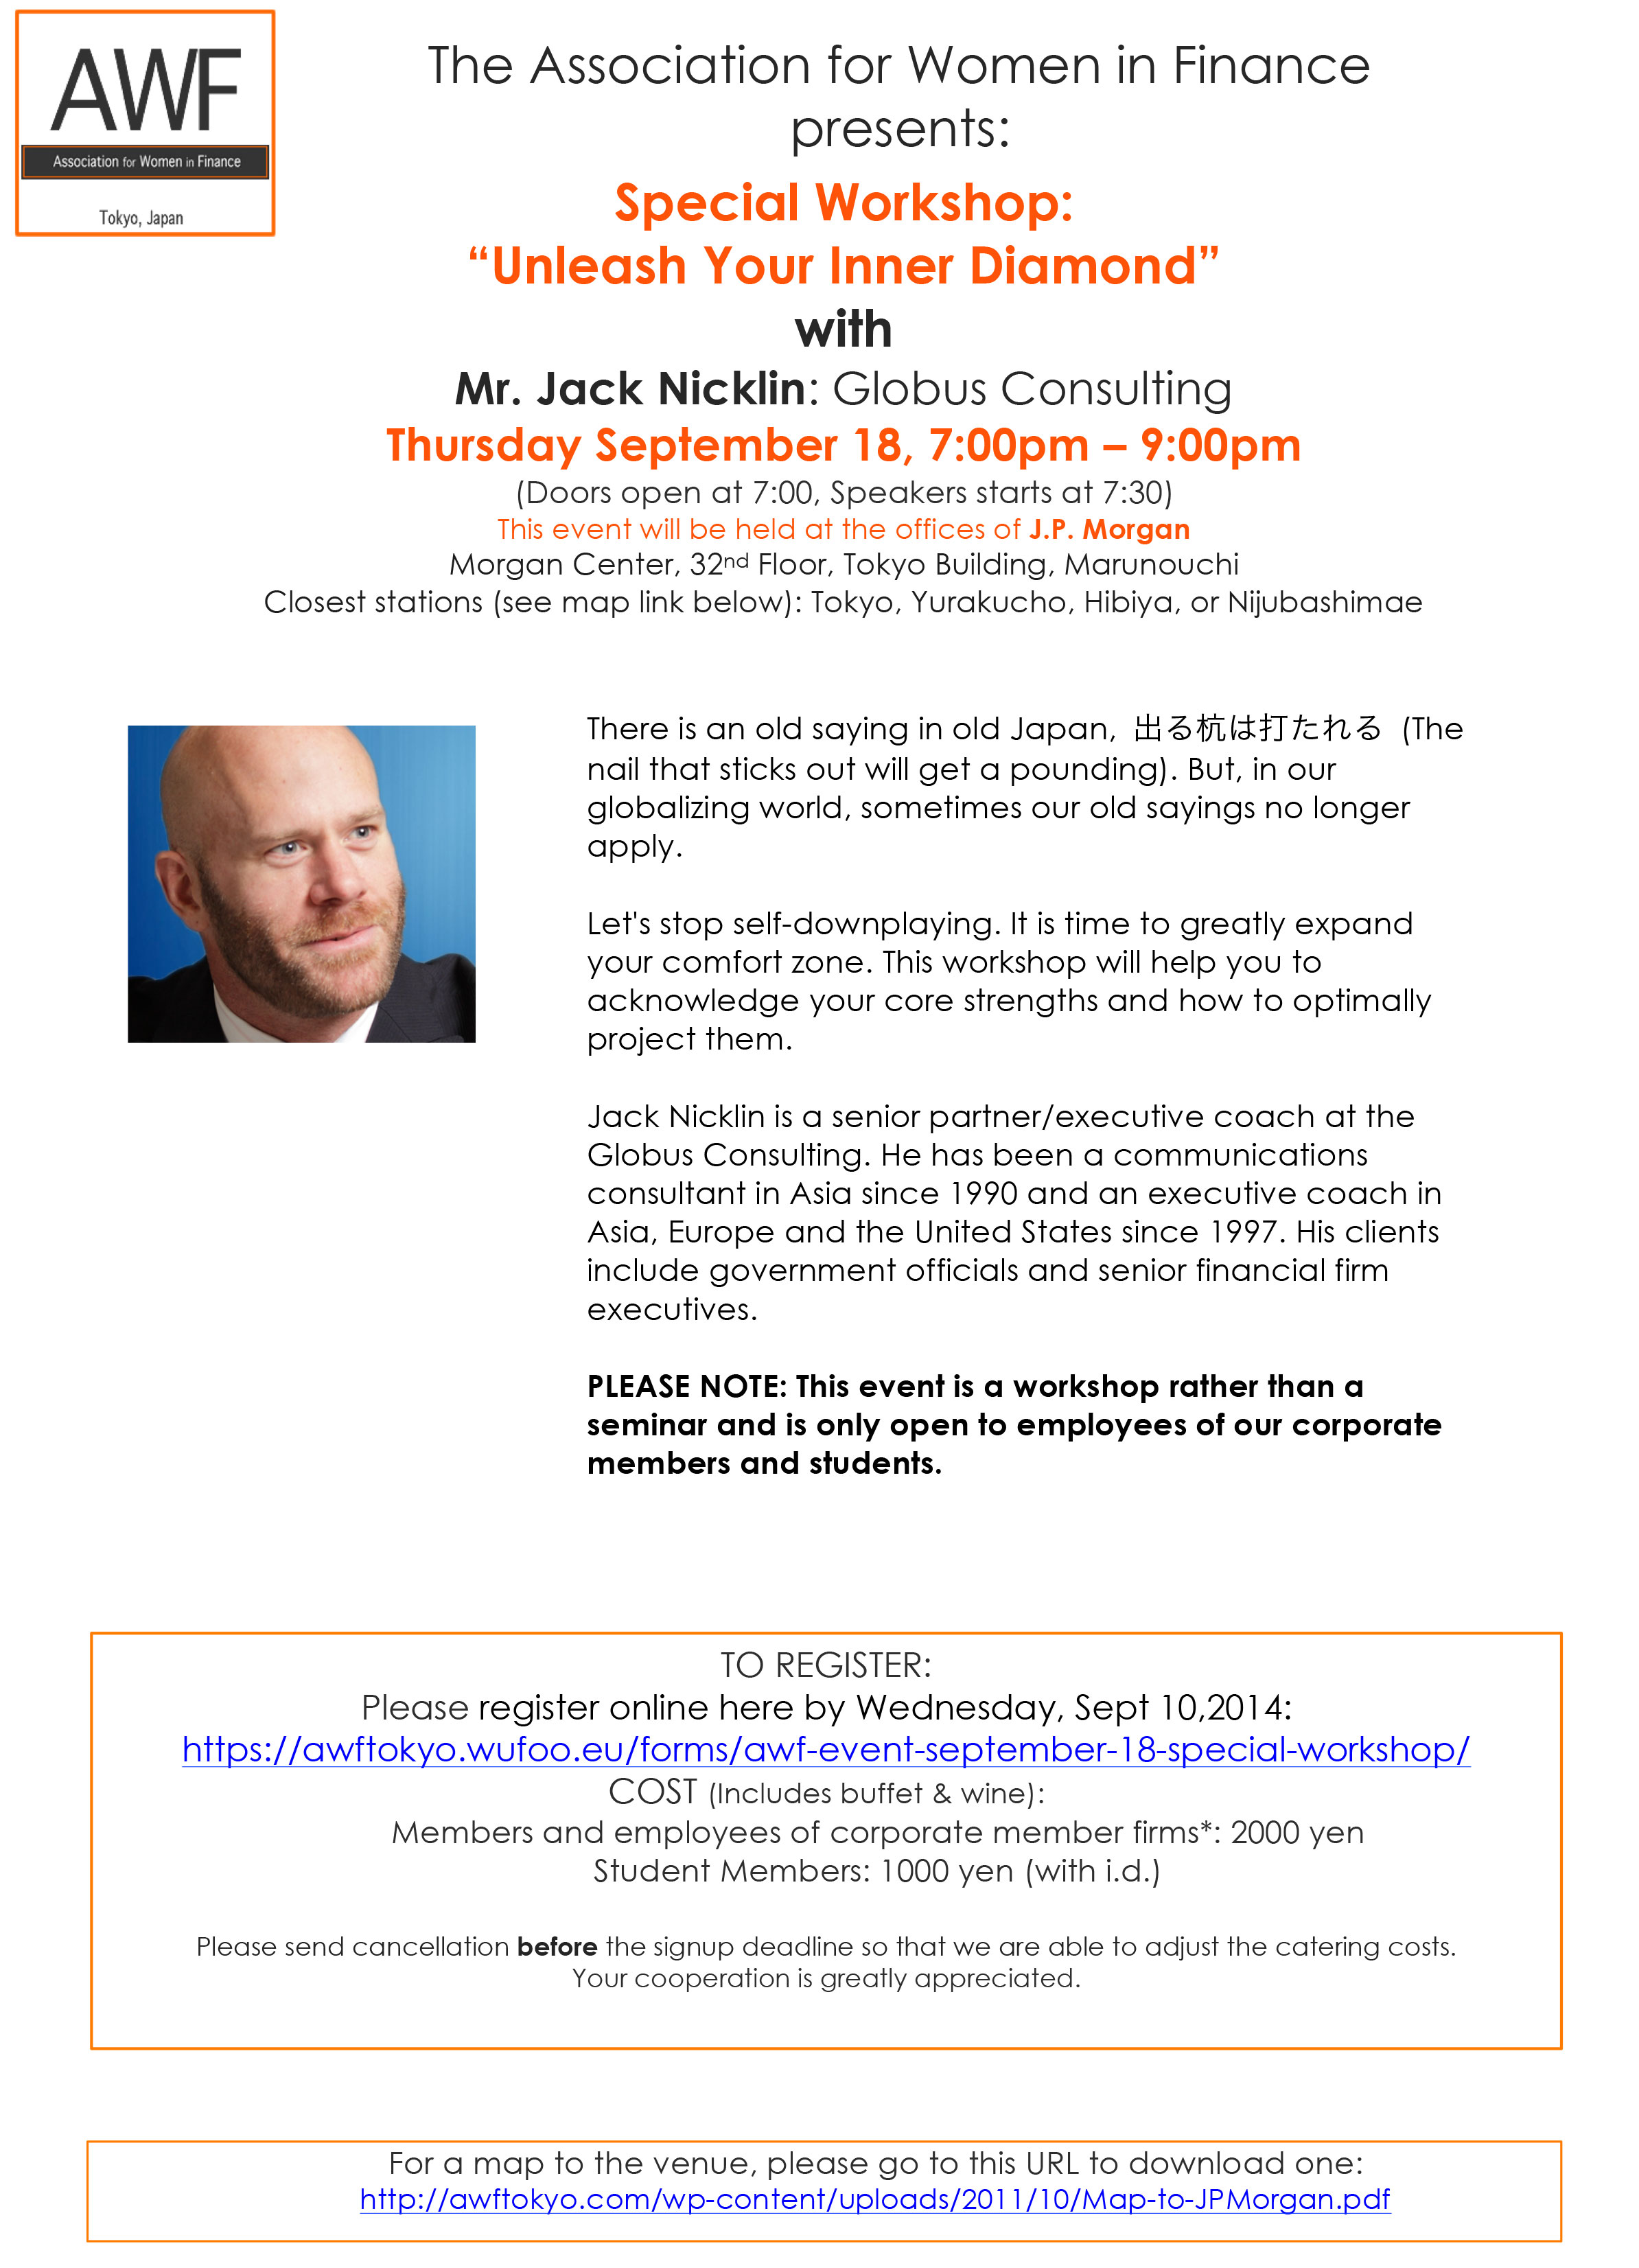 AWF-Sept2014-Jack-Nicklin-flyer-icon